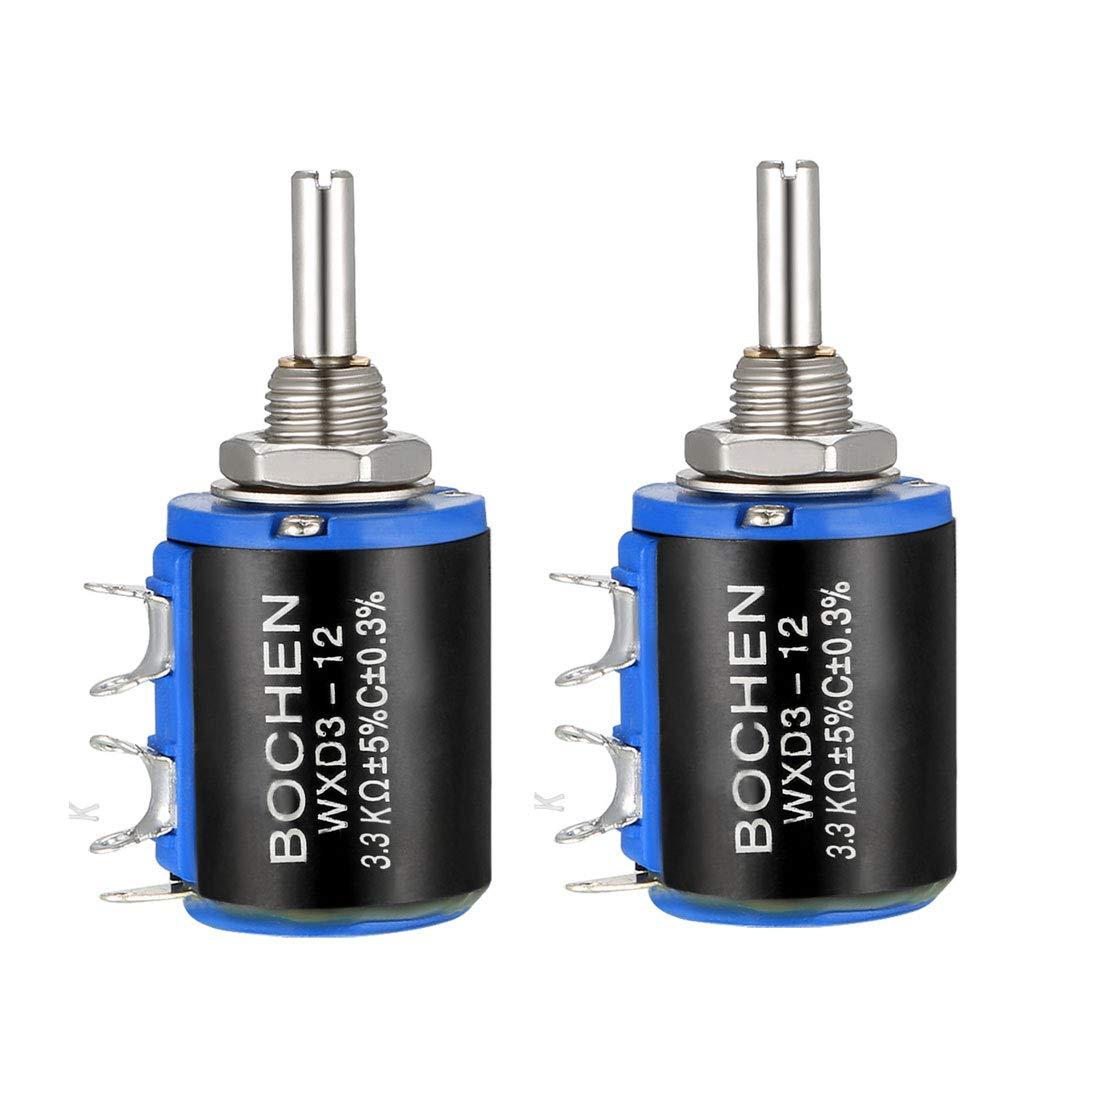 sourcing map 1K Ohm //1W Potentiometer Pots Adjustable Resistors Wire Wound Multi Turn Precision 1pcs